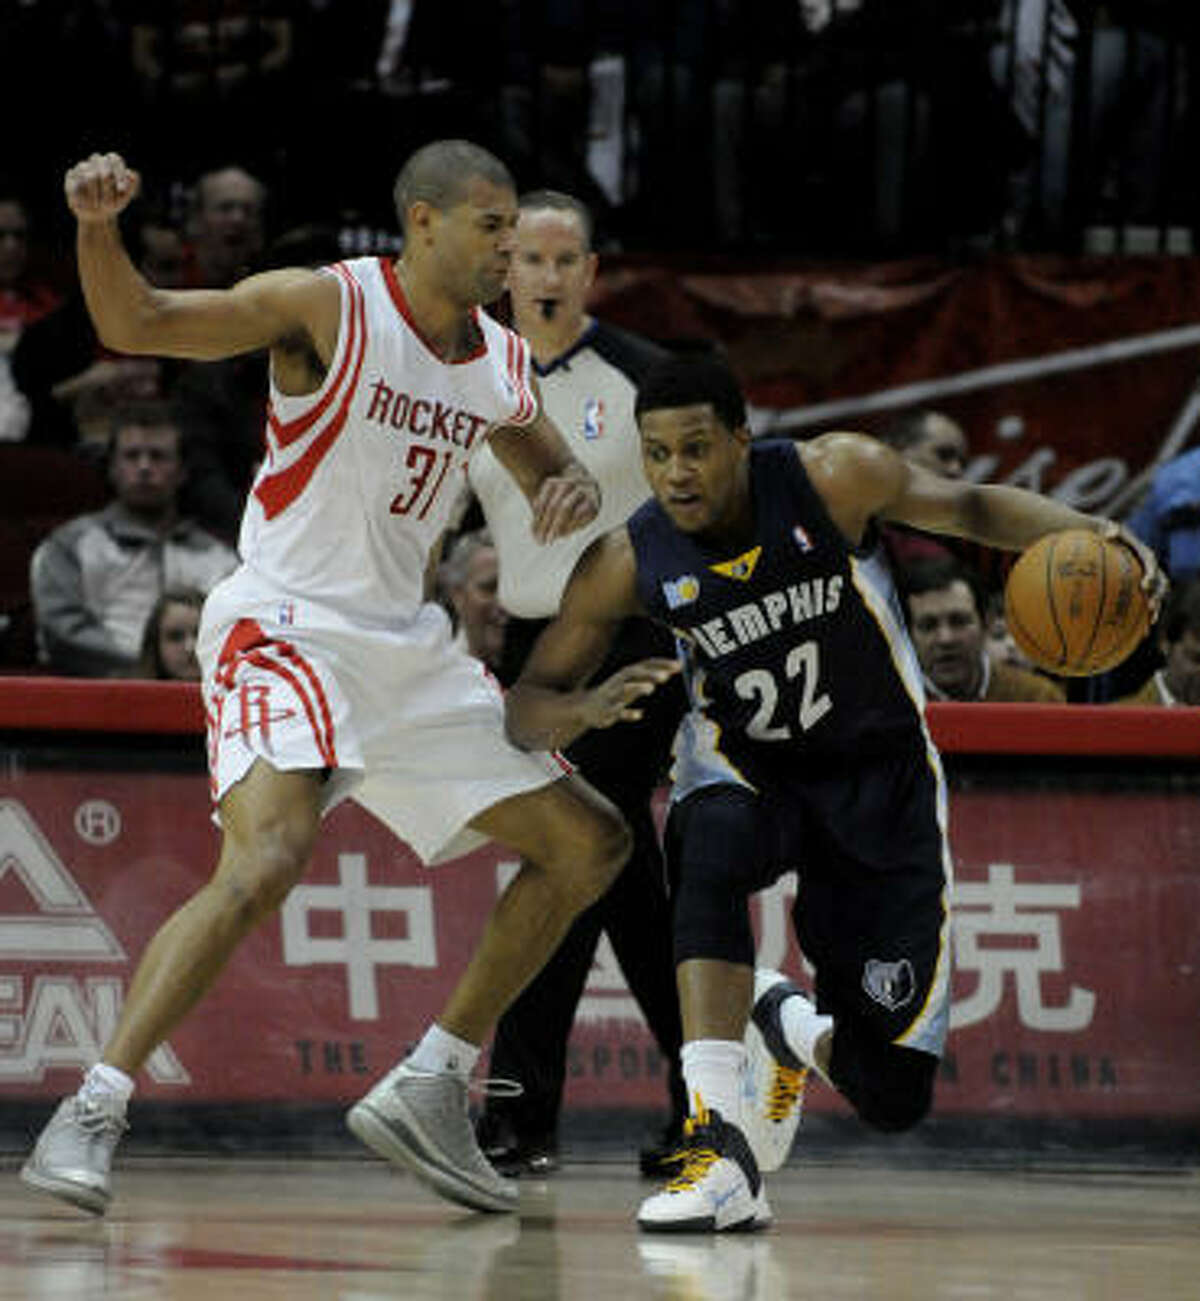 Grizzlies forward Rudy Gay (22) tries to get past Rockets forward Shane Battier (31).